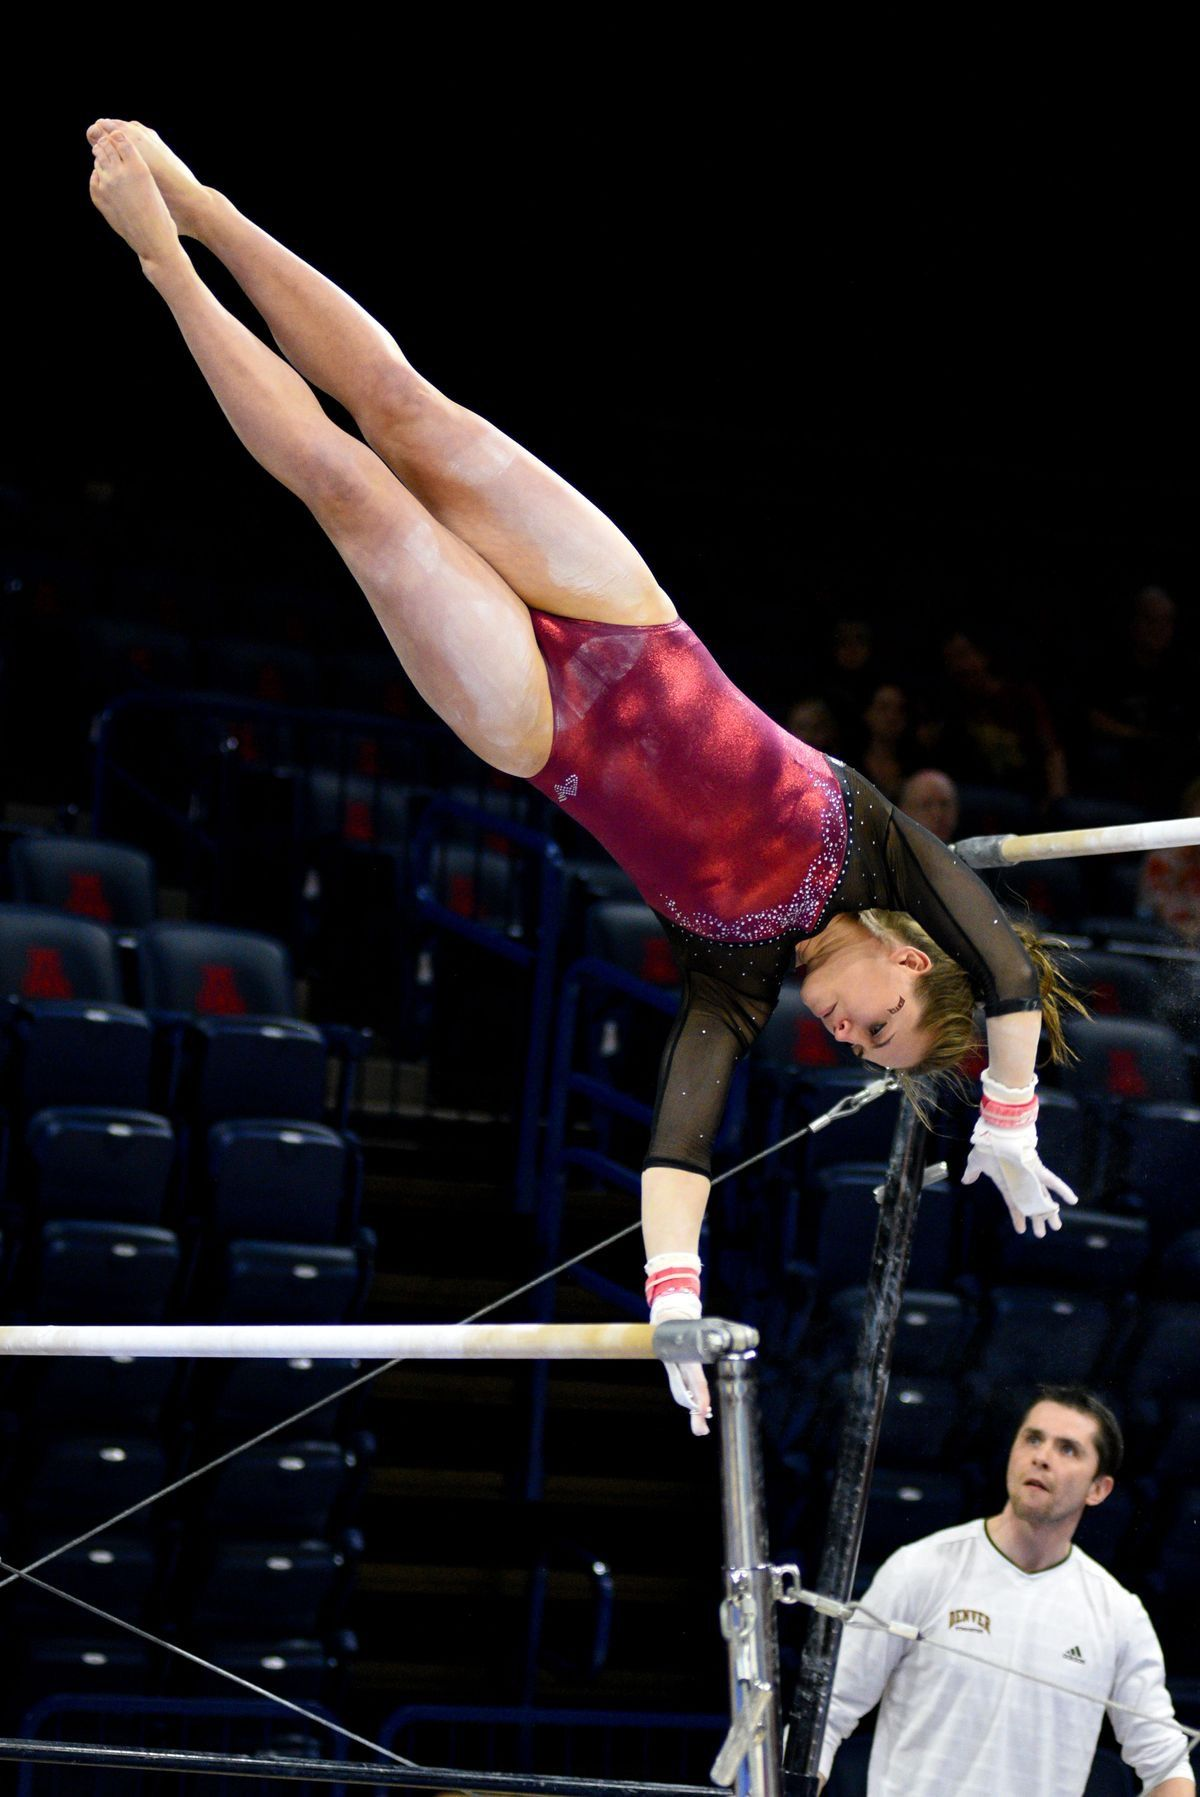 #louisiana LSU defeats #1 Oklahoma in womens gymnastics